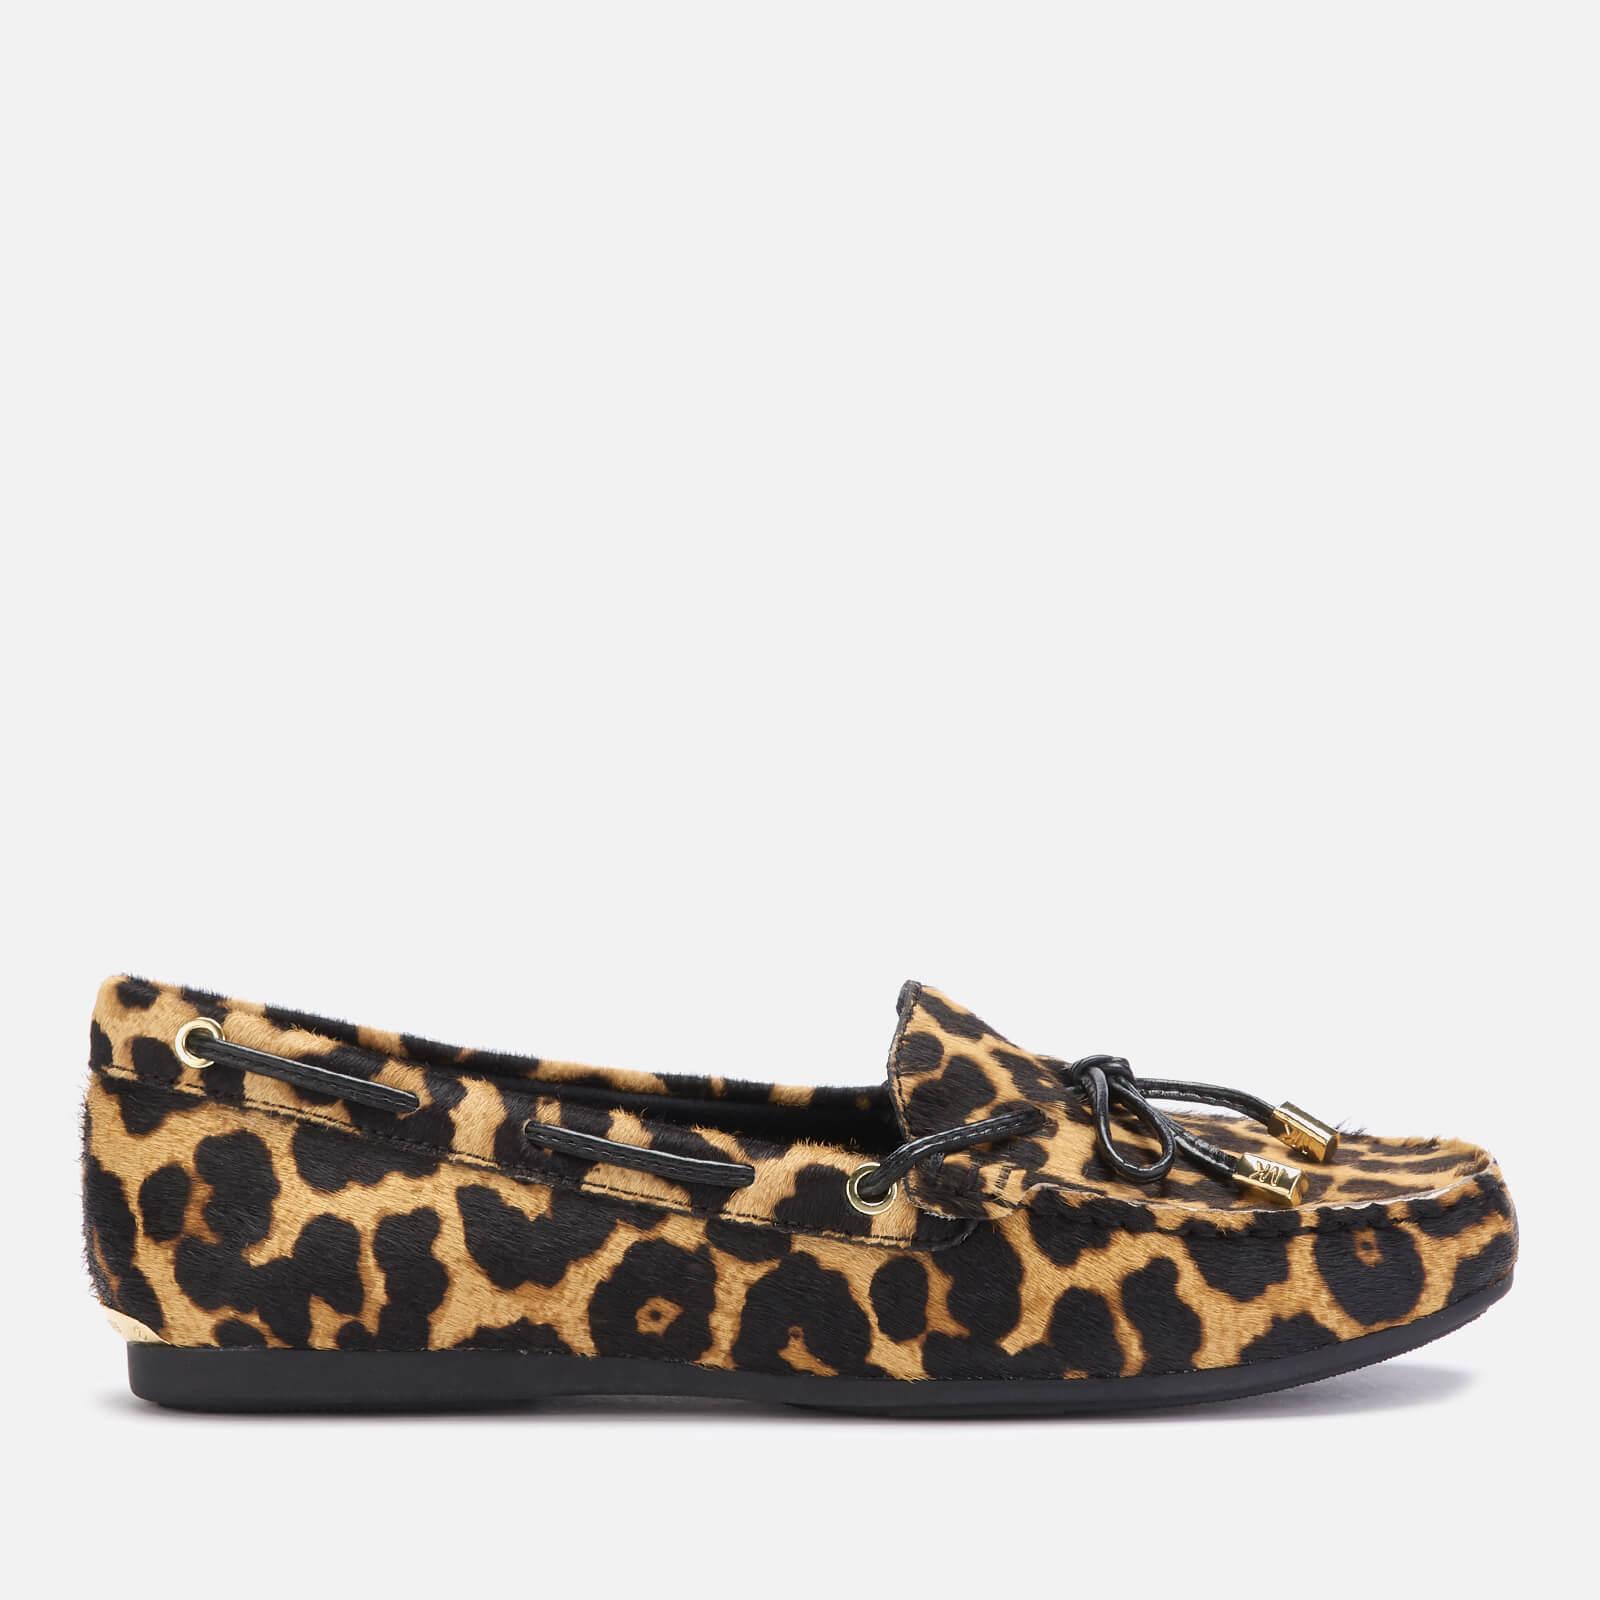 MICHAEL MICHAEL KORS Women's Sutton Leopard Moc Flats - Natural - UK 6/US 9 - Tan